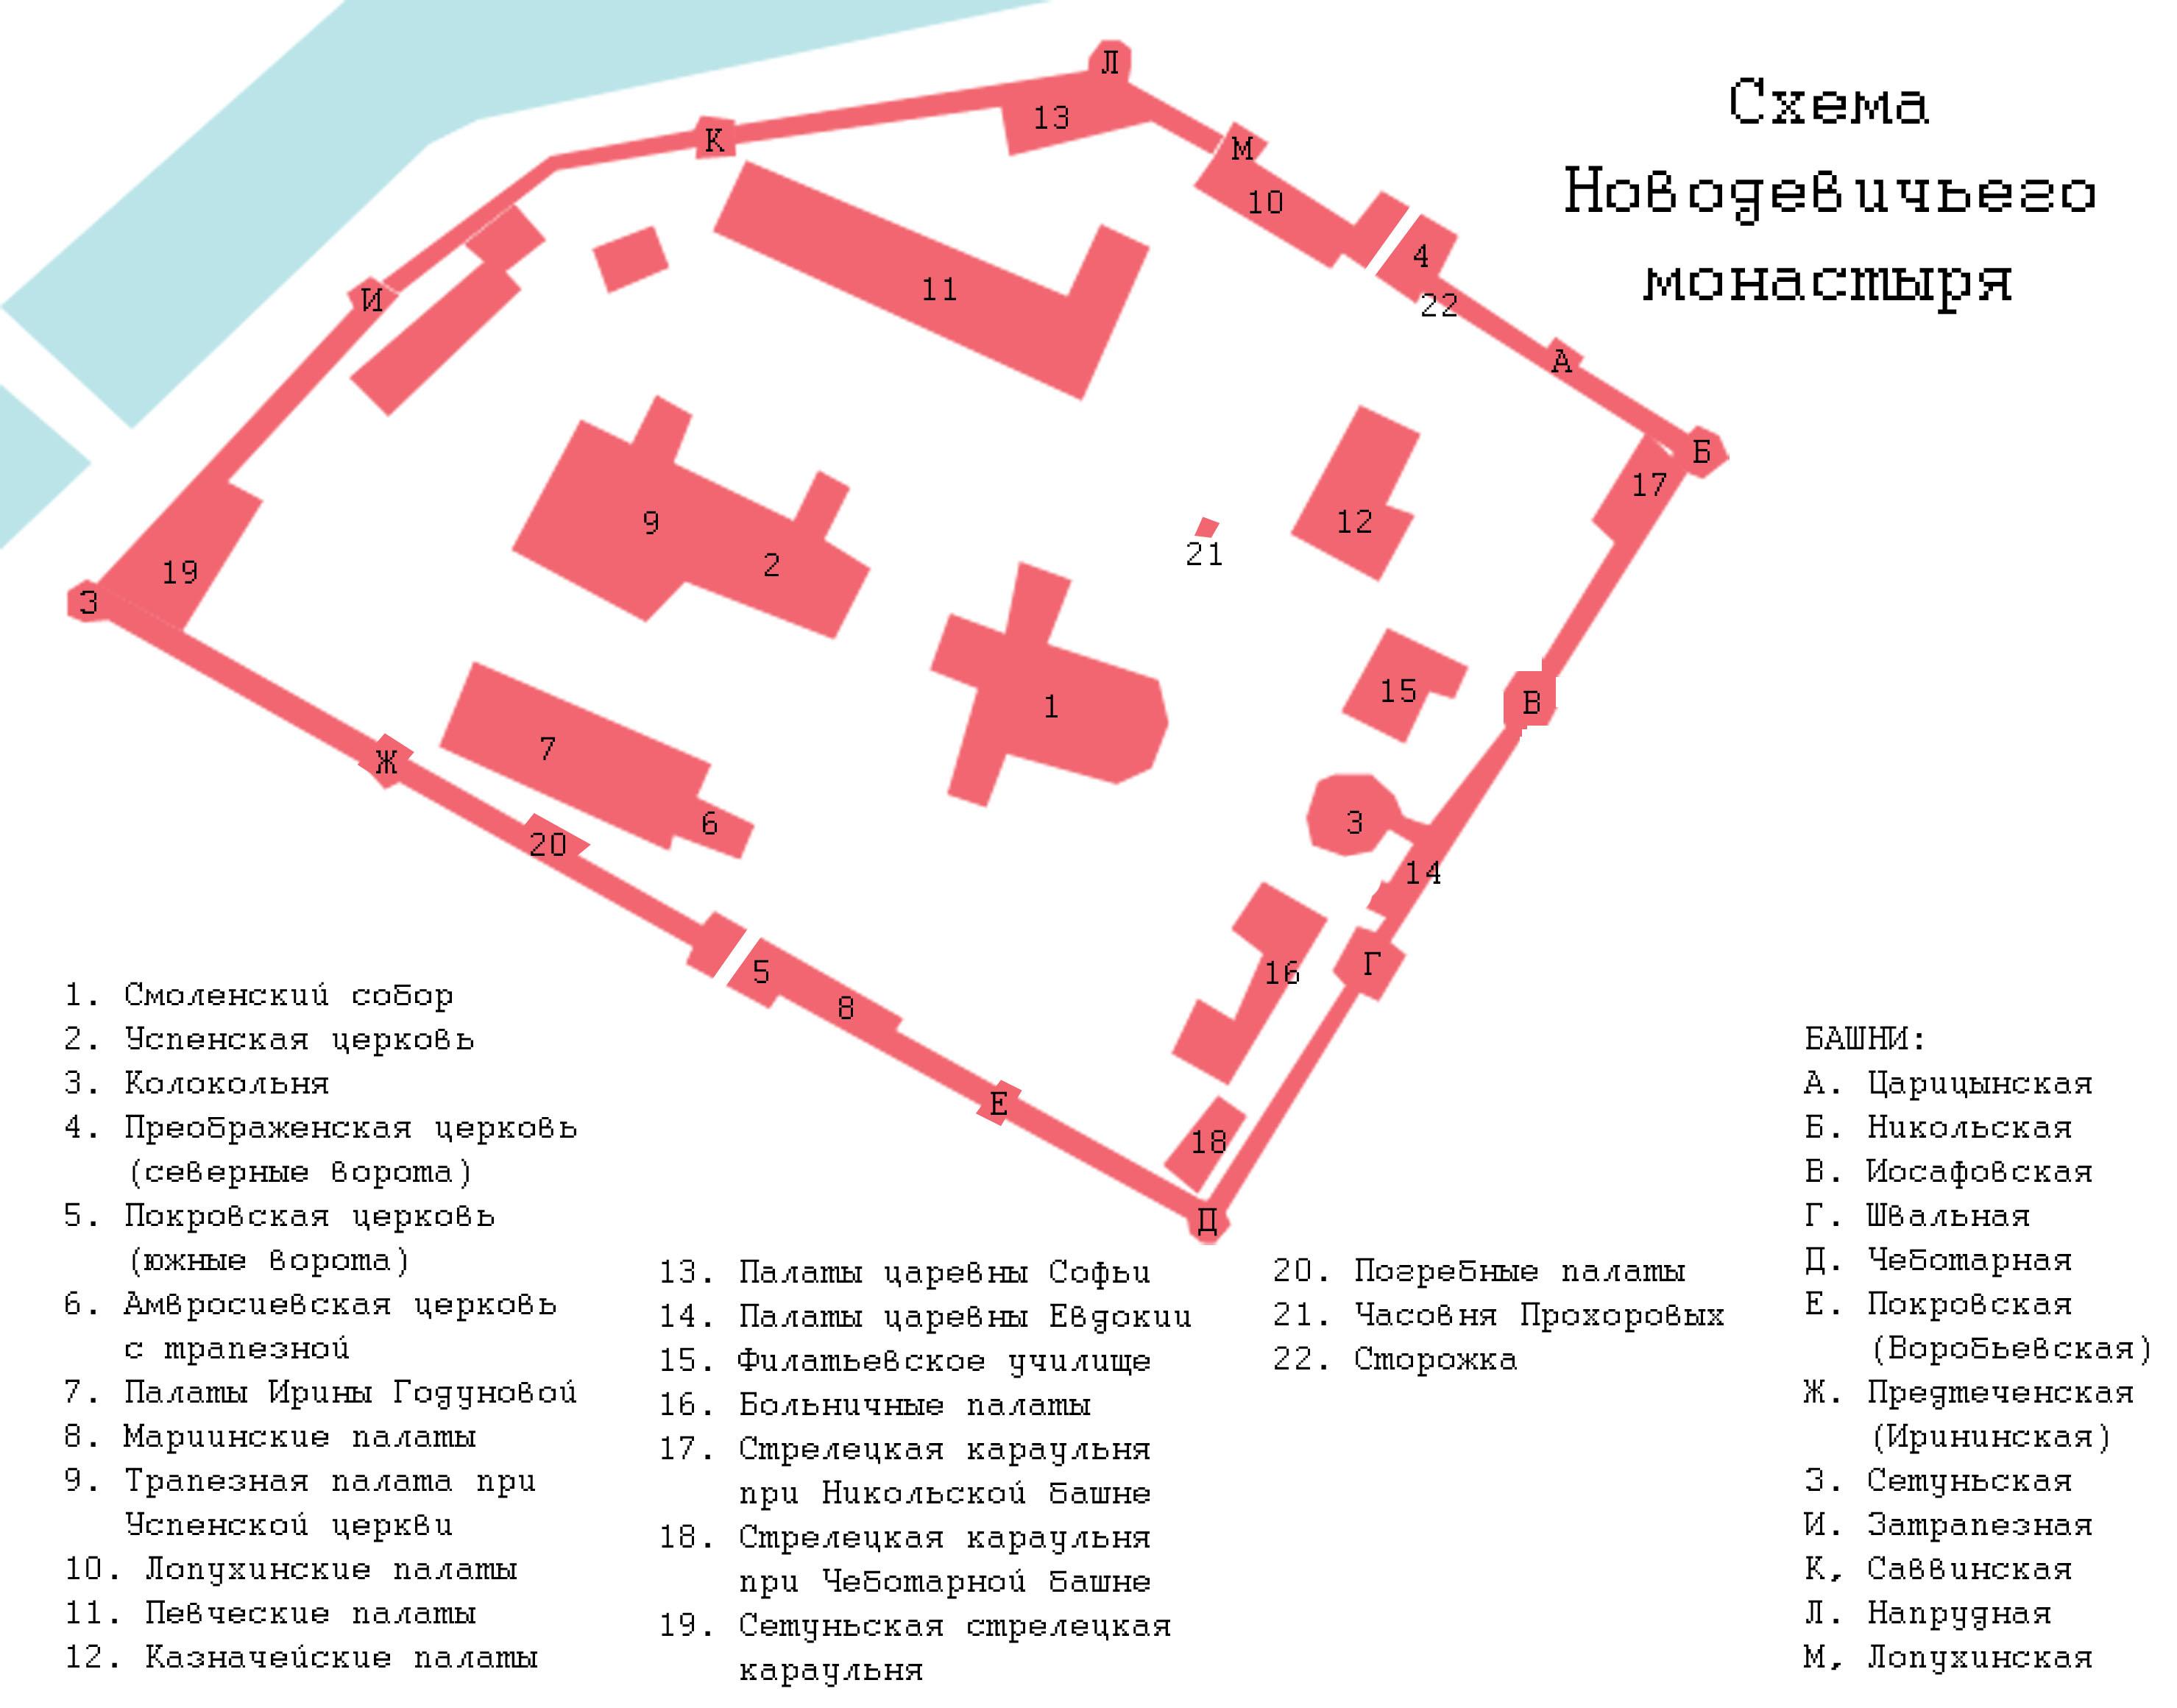 Novodevichy monastery - scheme (by shakko).jpg